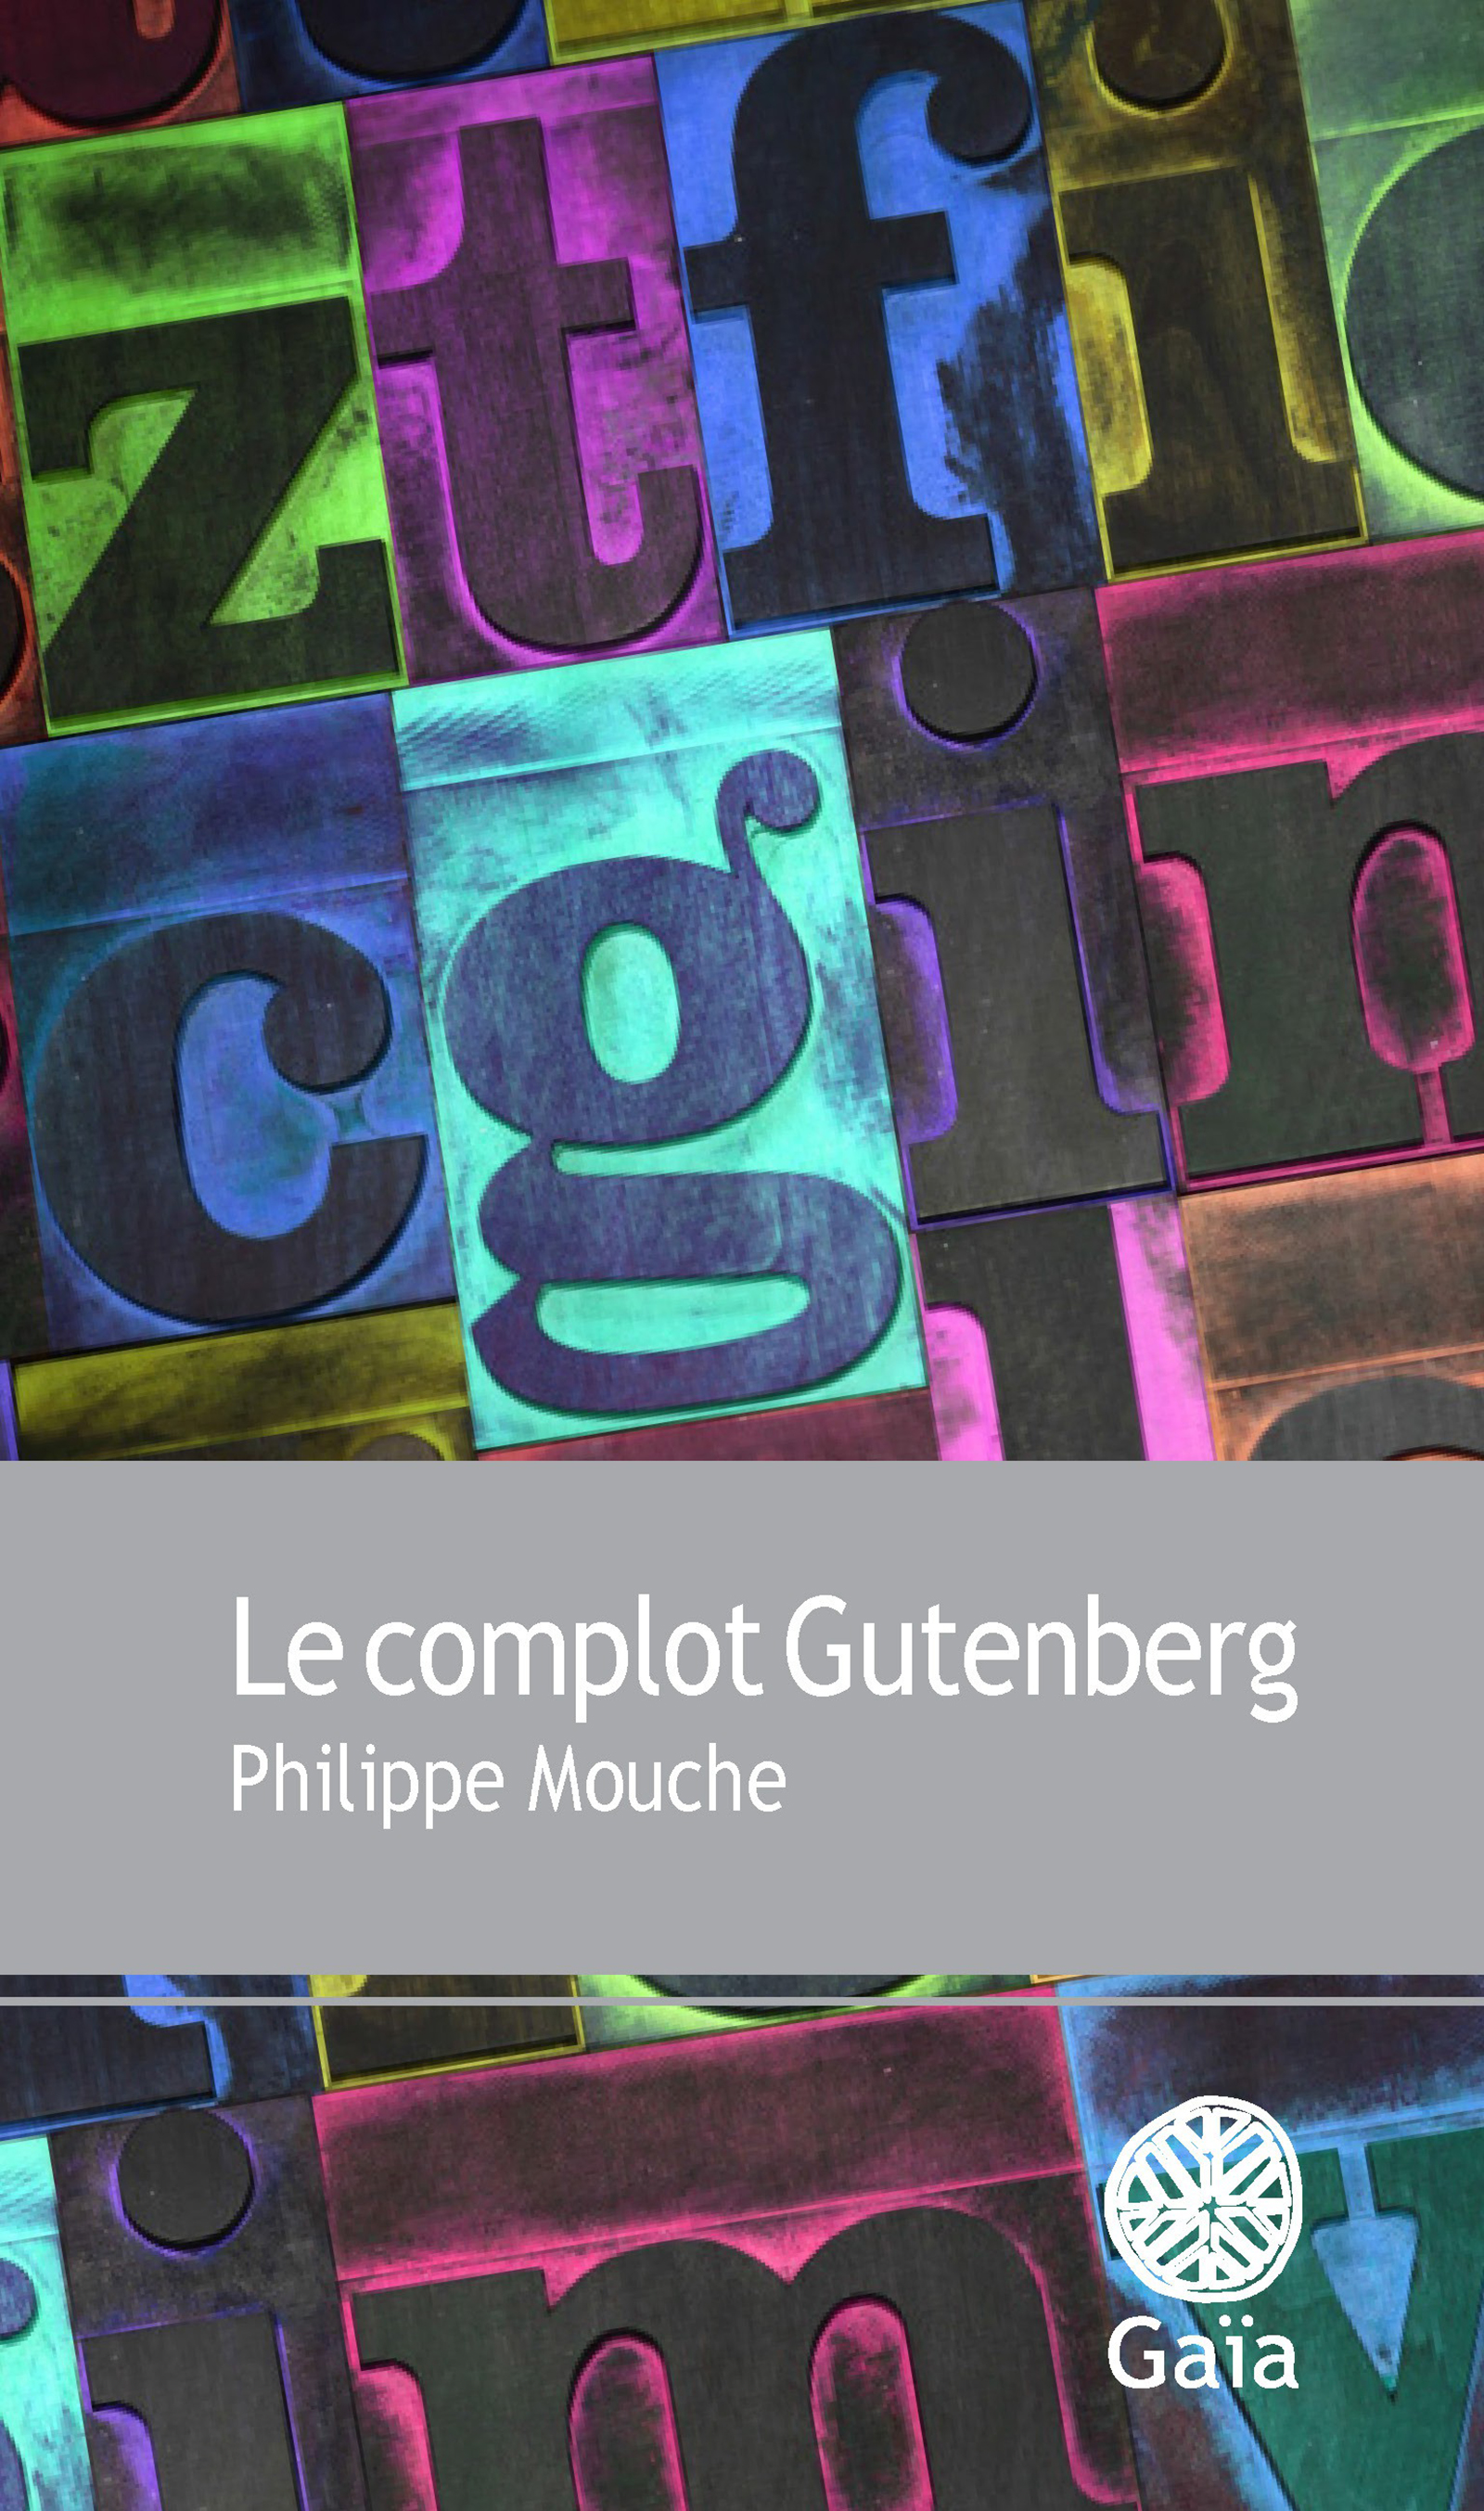 Le complot Gutenberg